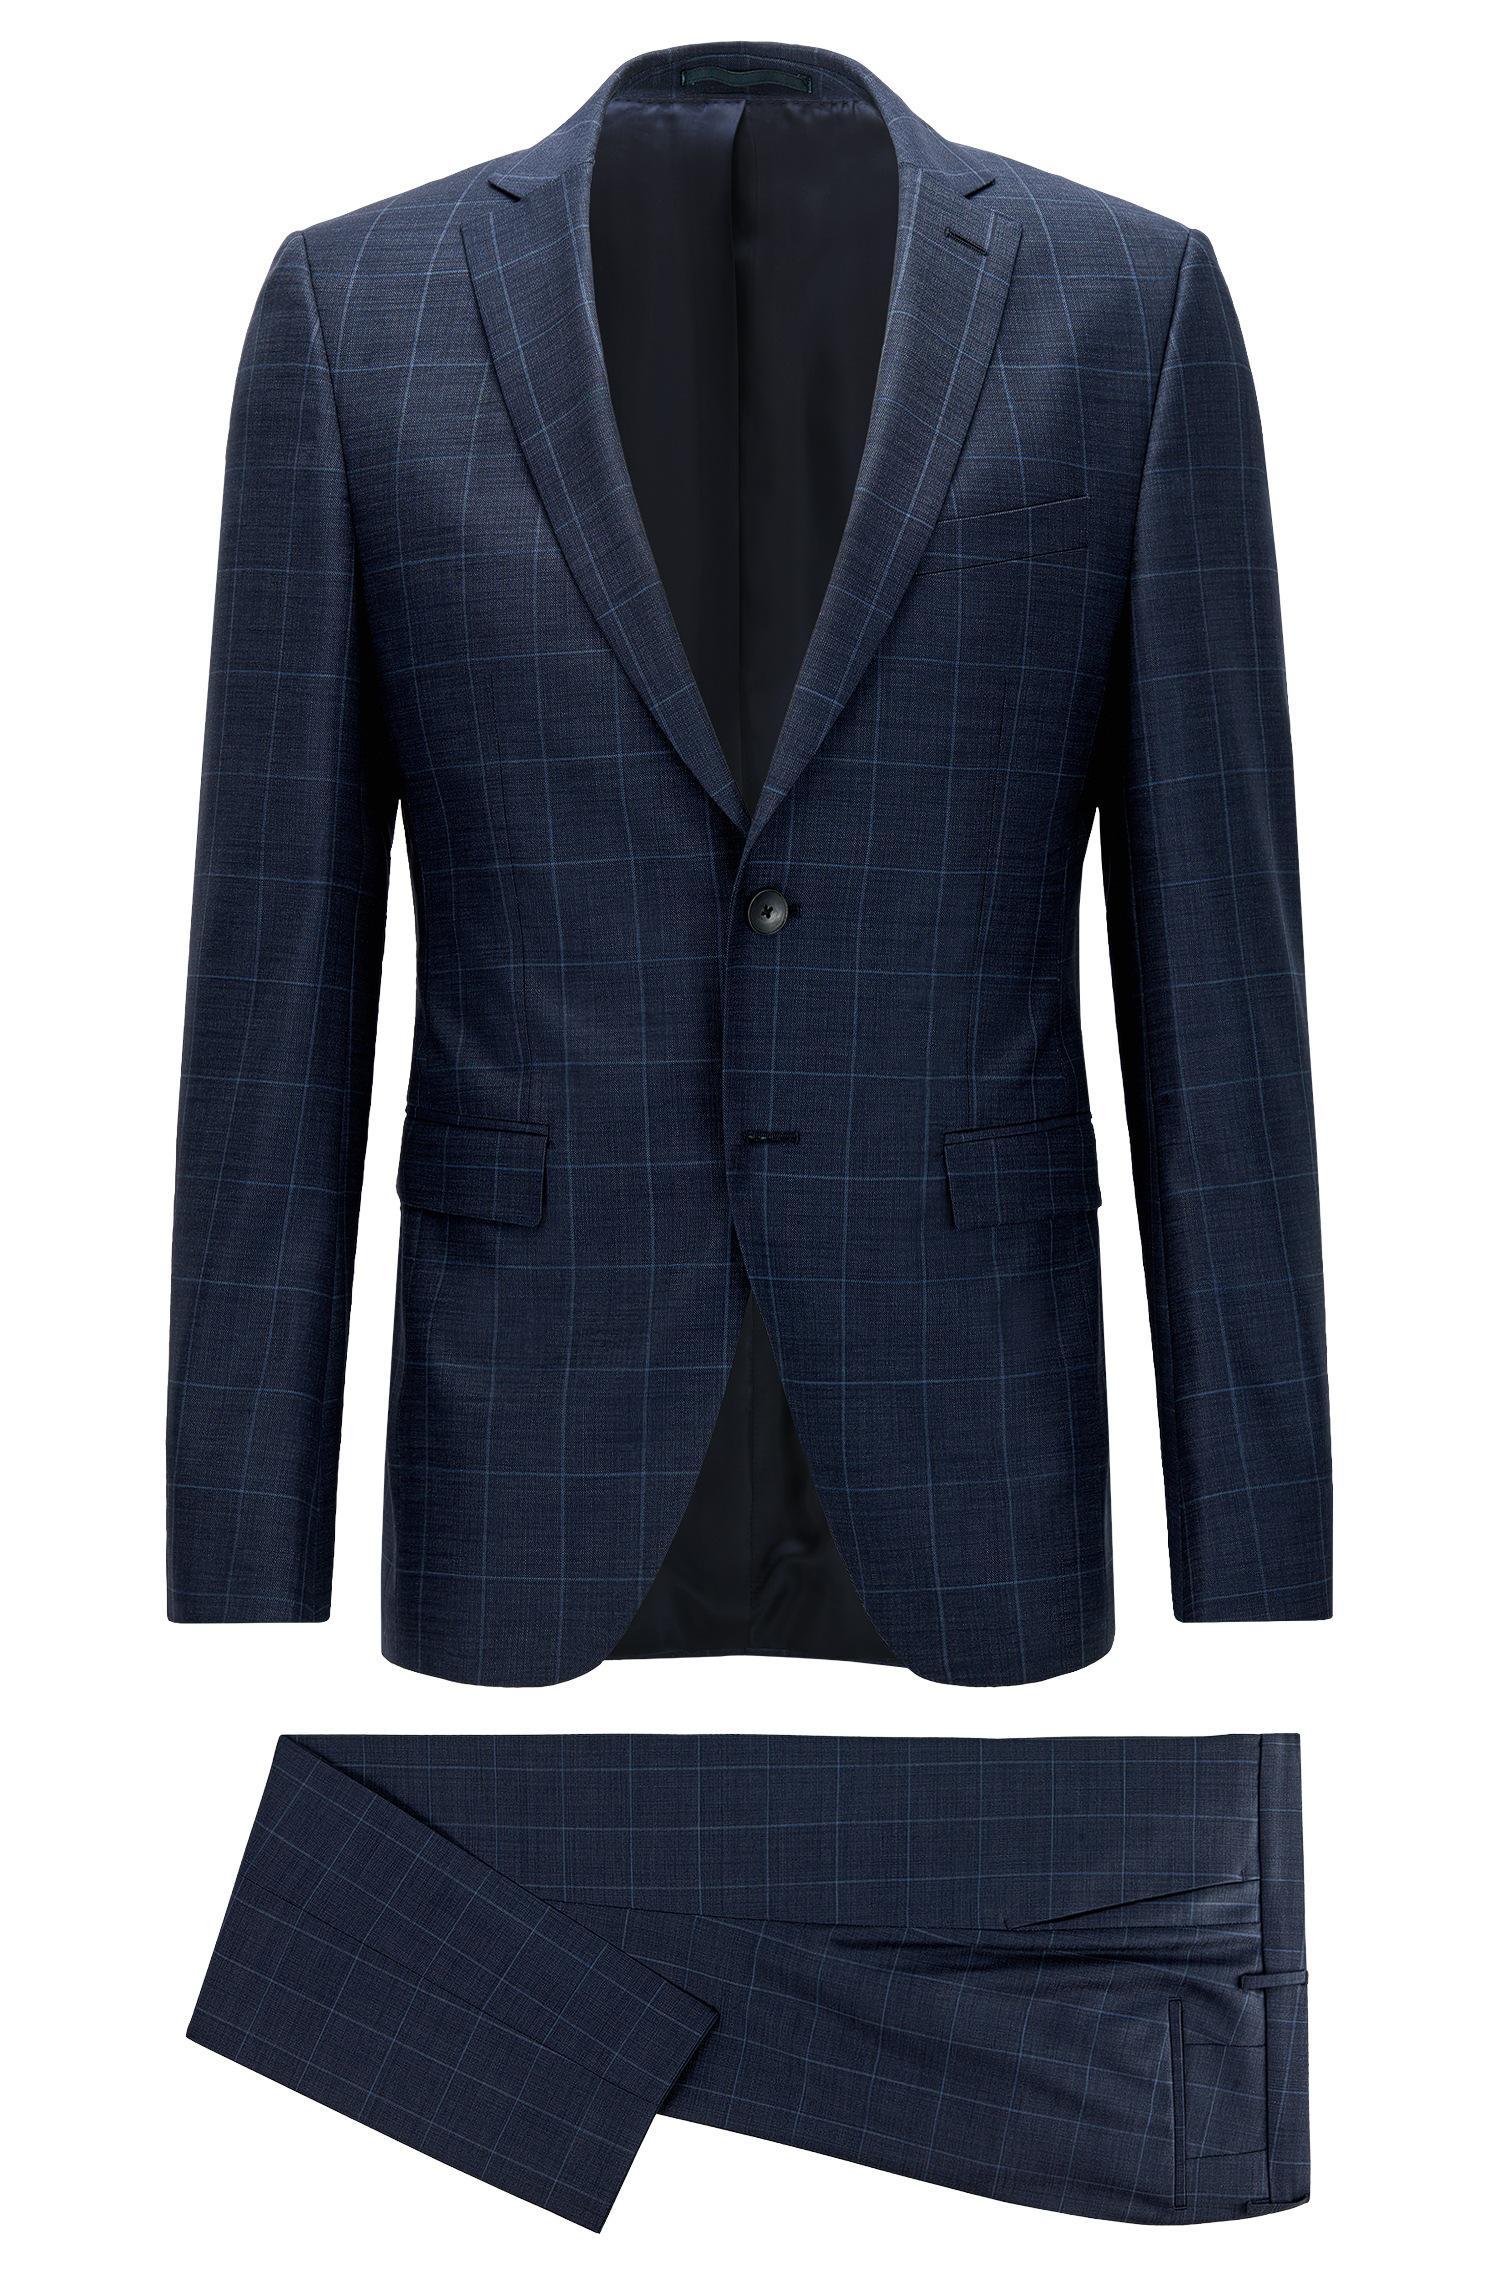 boss extra slim fit suit in virgin wool in blue for men lyst. Black Bedroom Furniture Sets. Home Design Ideas